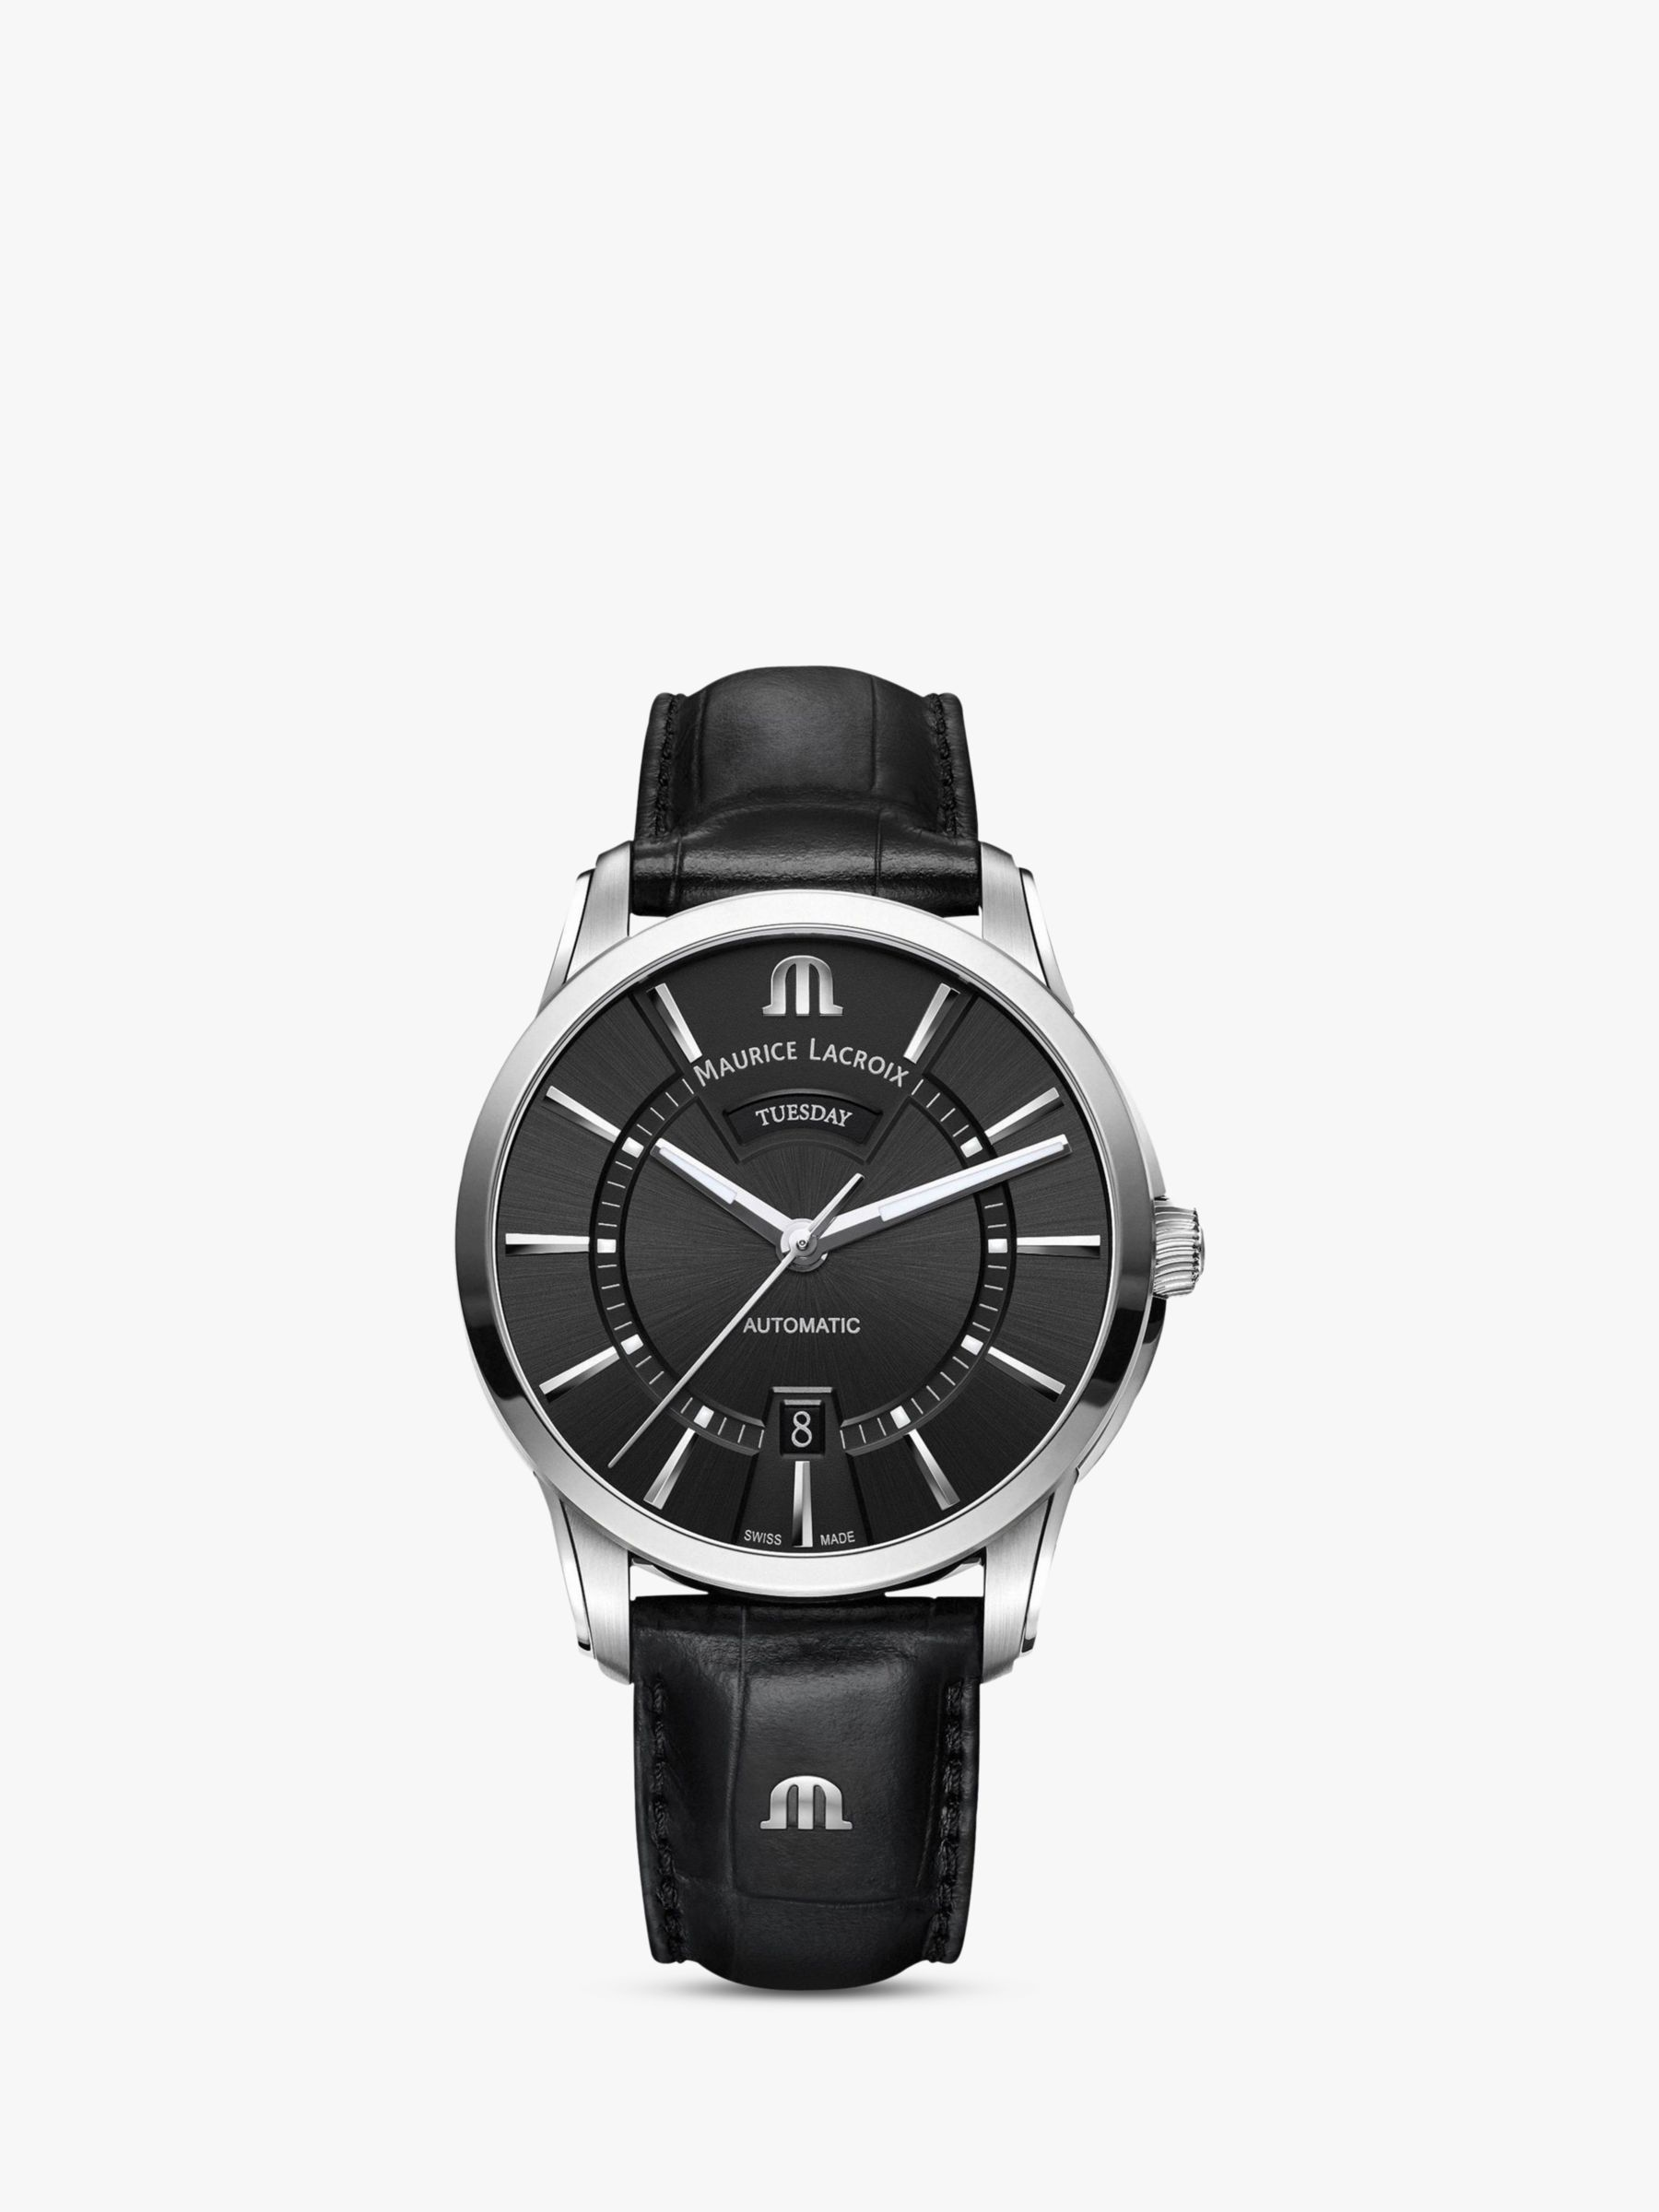 Maurice Lacroix Maurice Lacroix PT6358-SS001-330-1 Men's Pontos Automatic Day Date Leather Strap Watch, Black